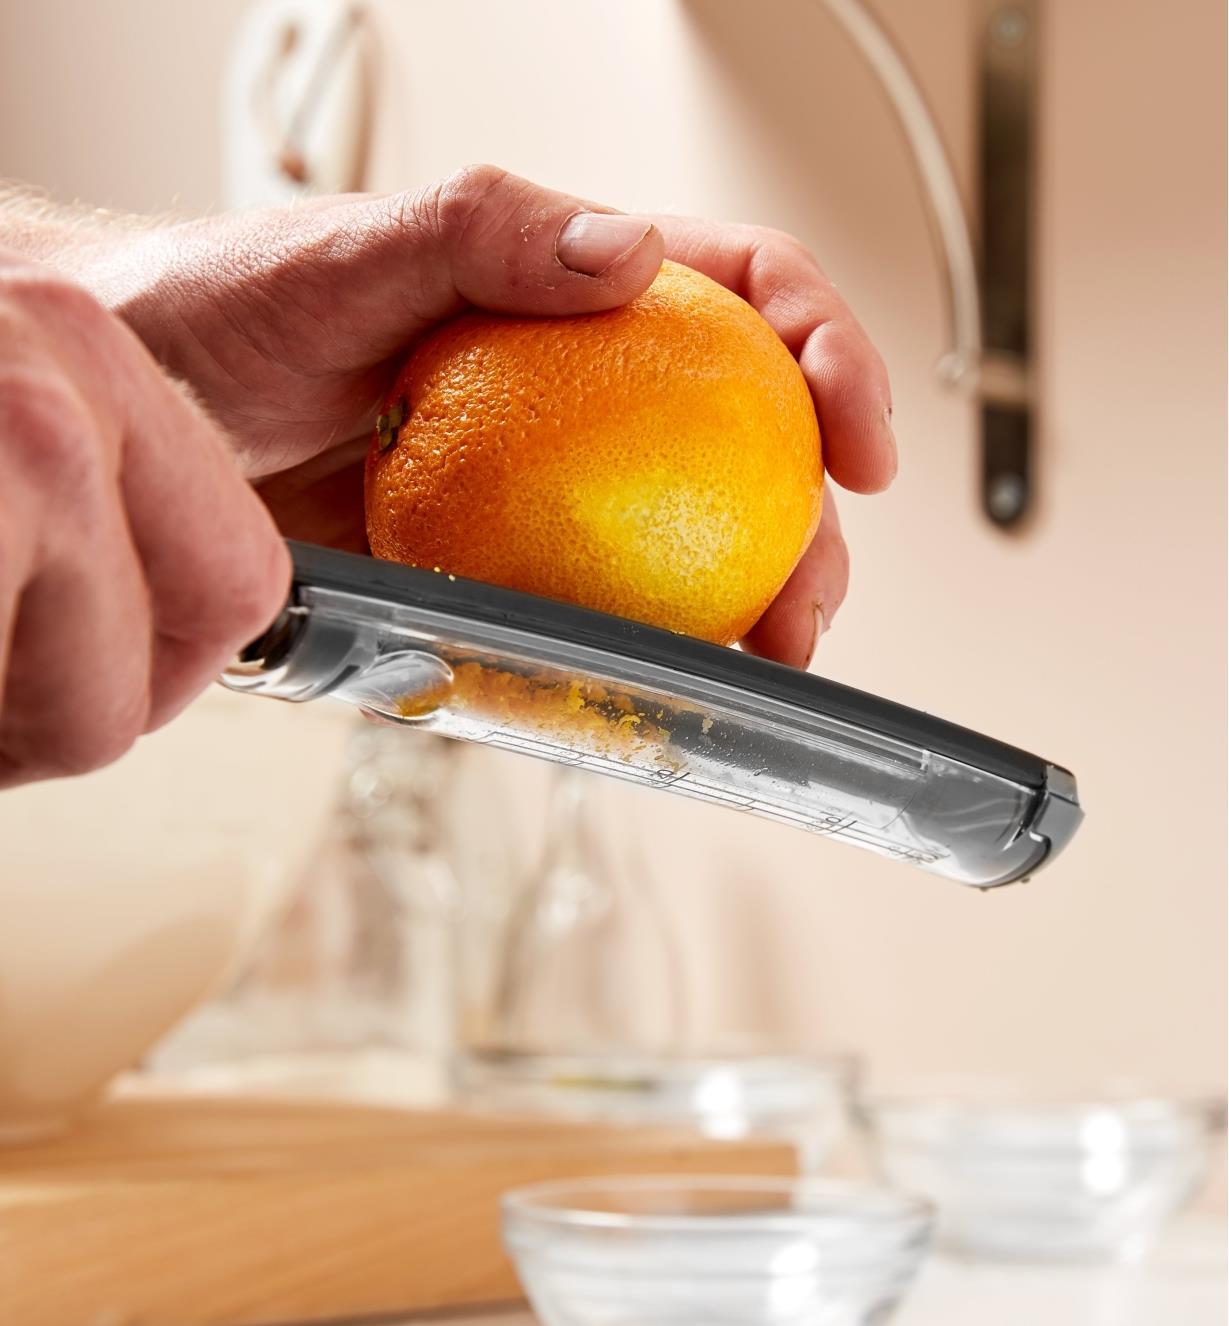 Zesting an orange